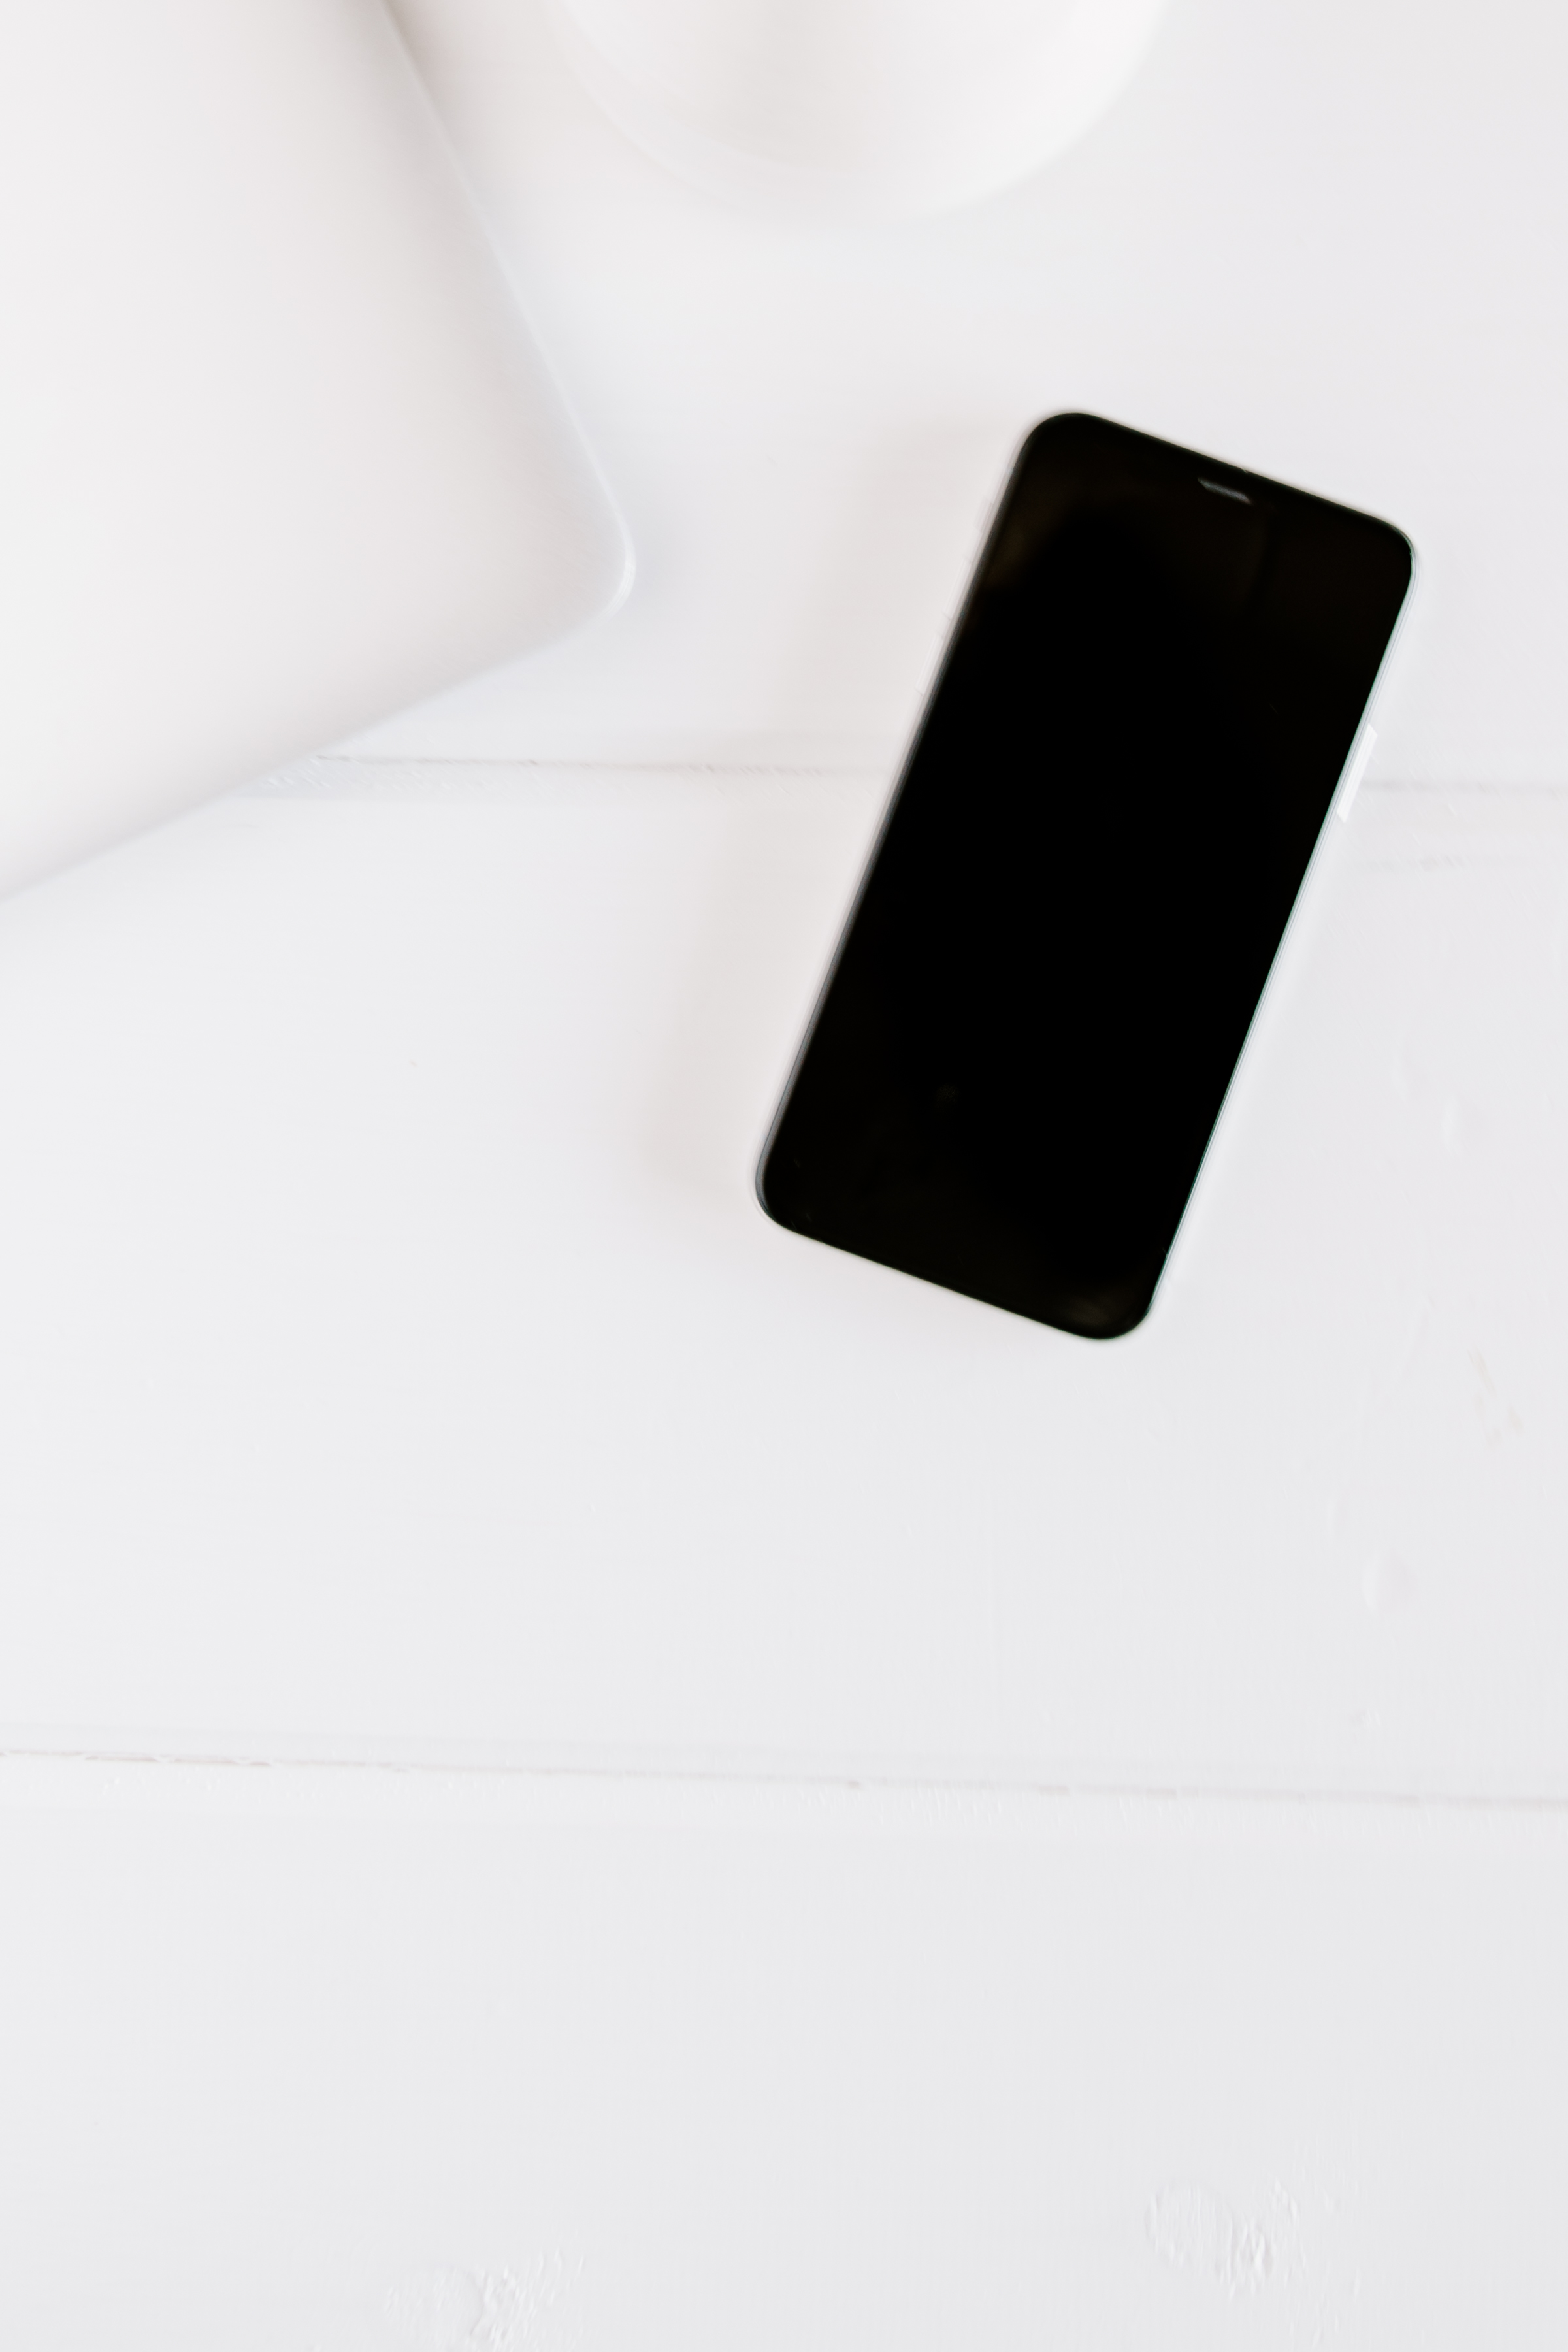 PBD-FarmhouseiPhone-Mockups-10.jpg